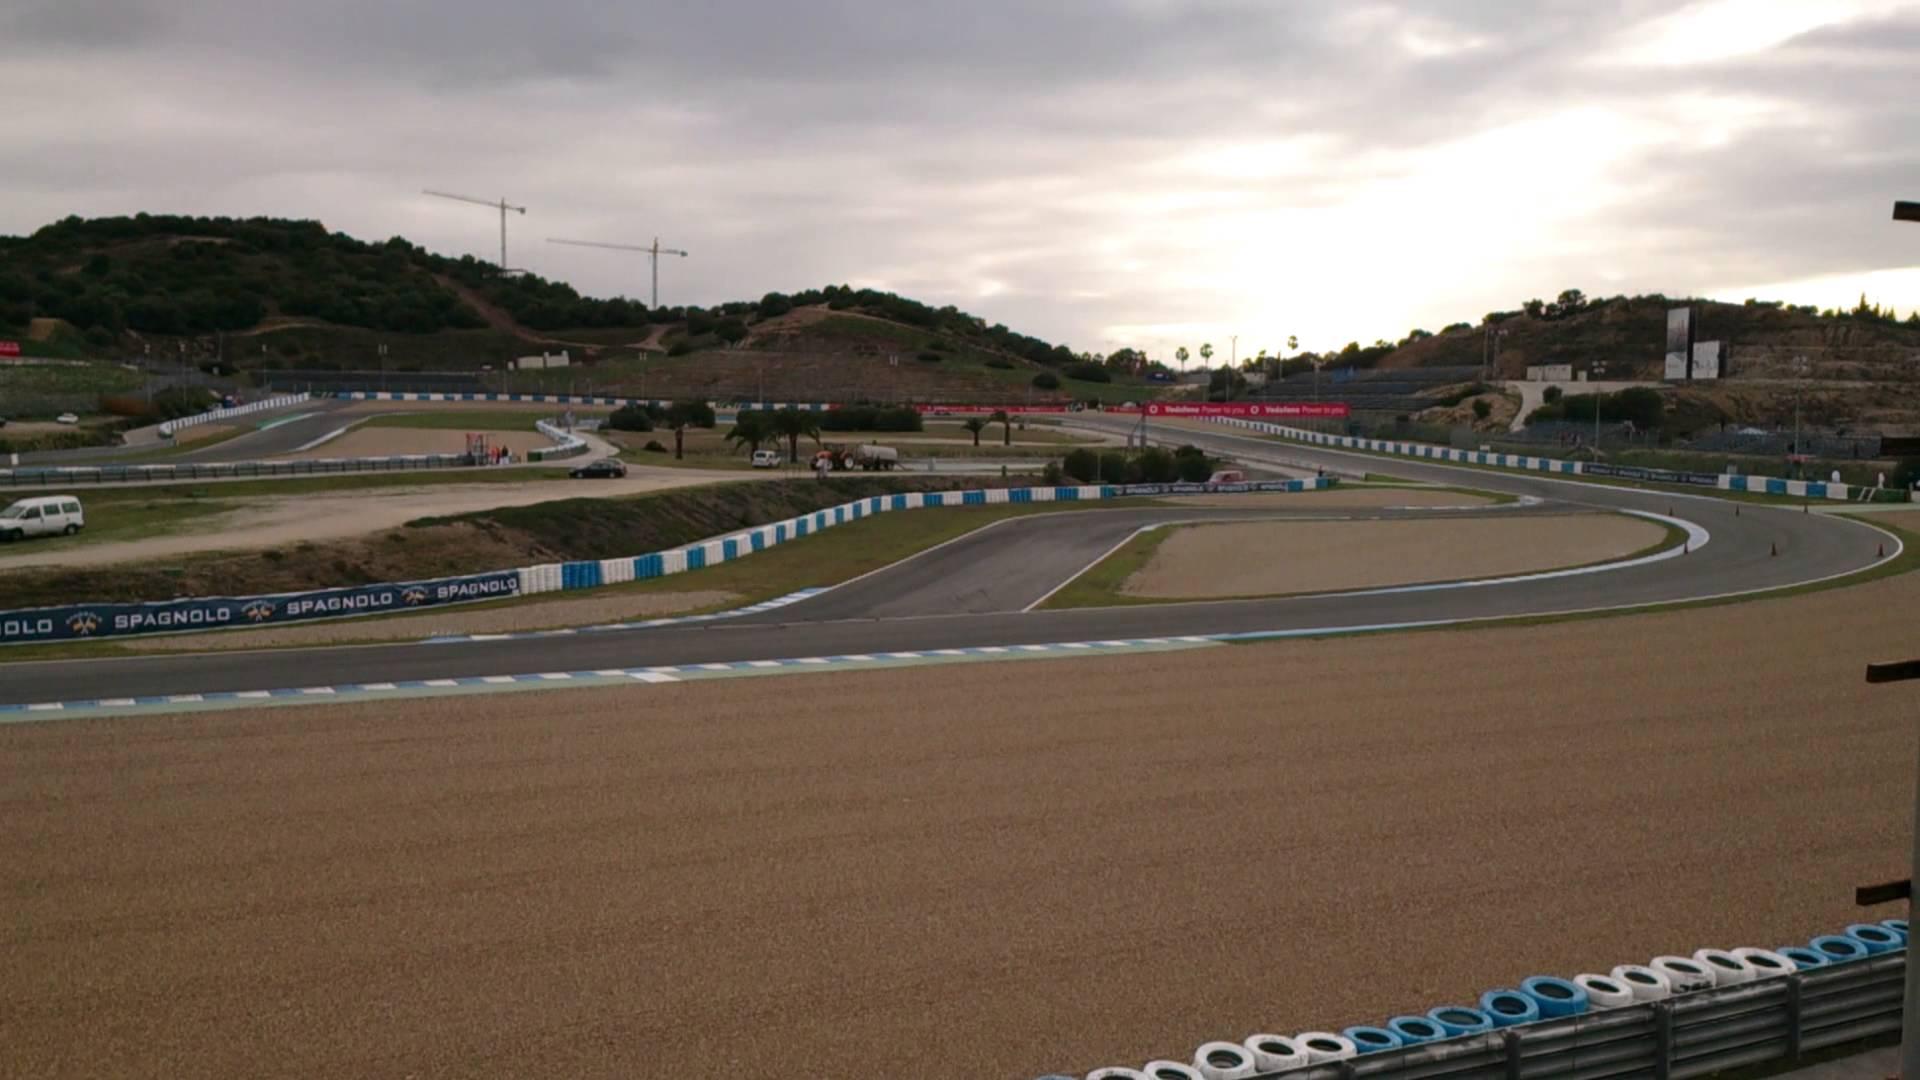 Motogp gran premio Spagna Jerez